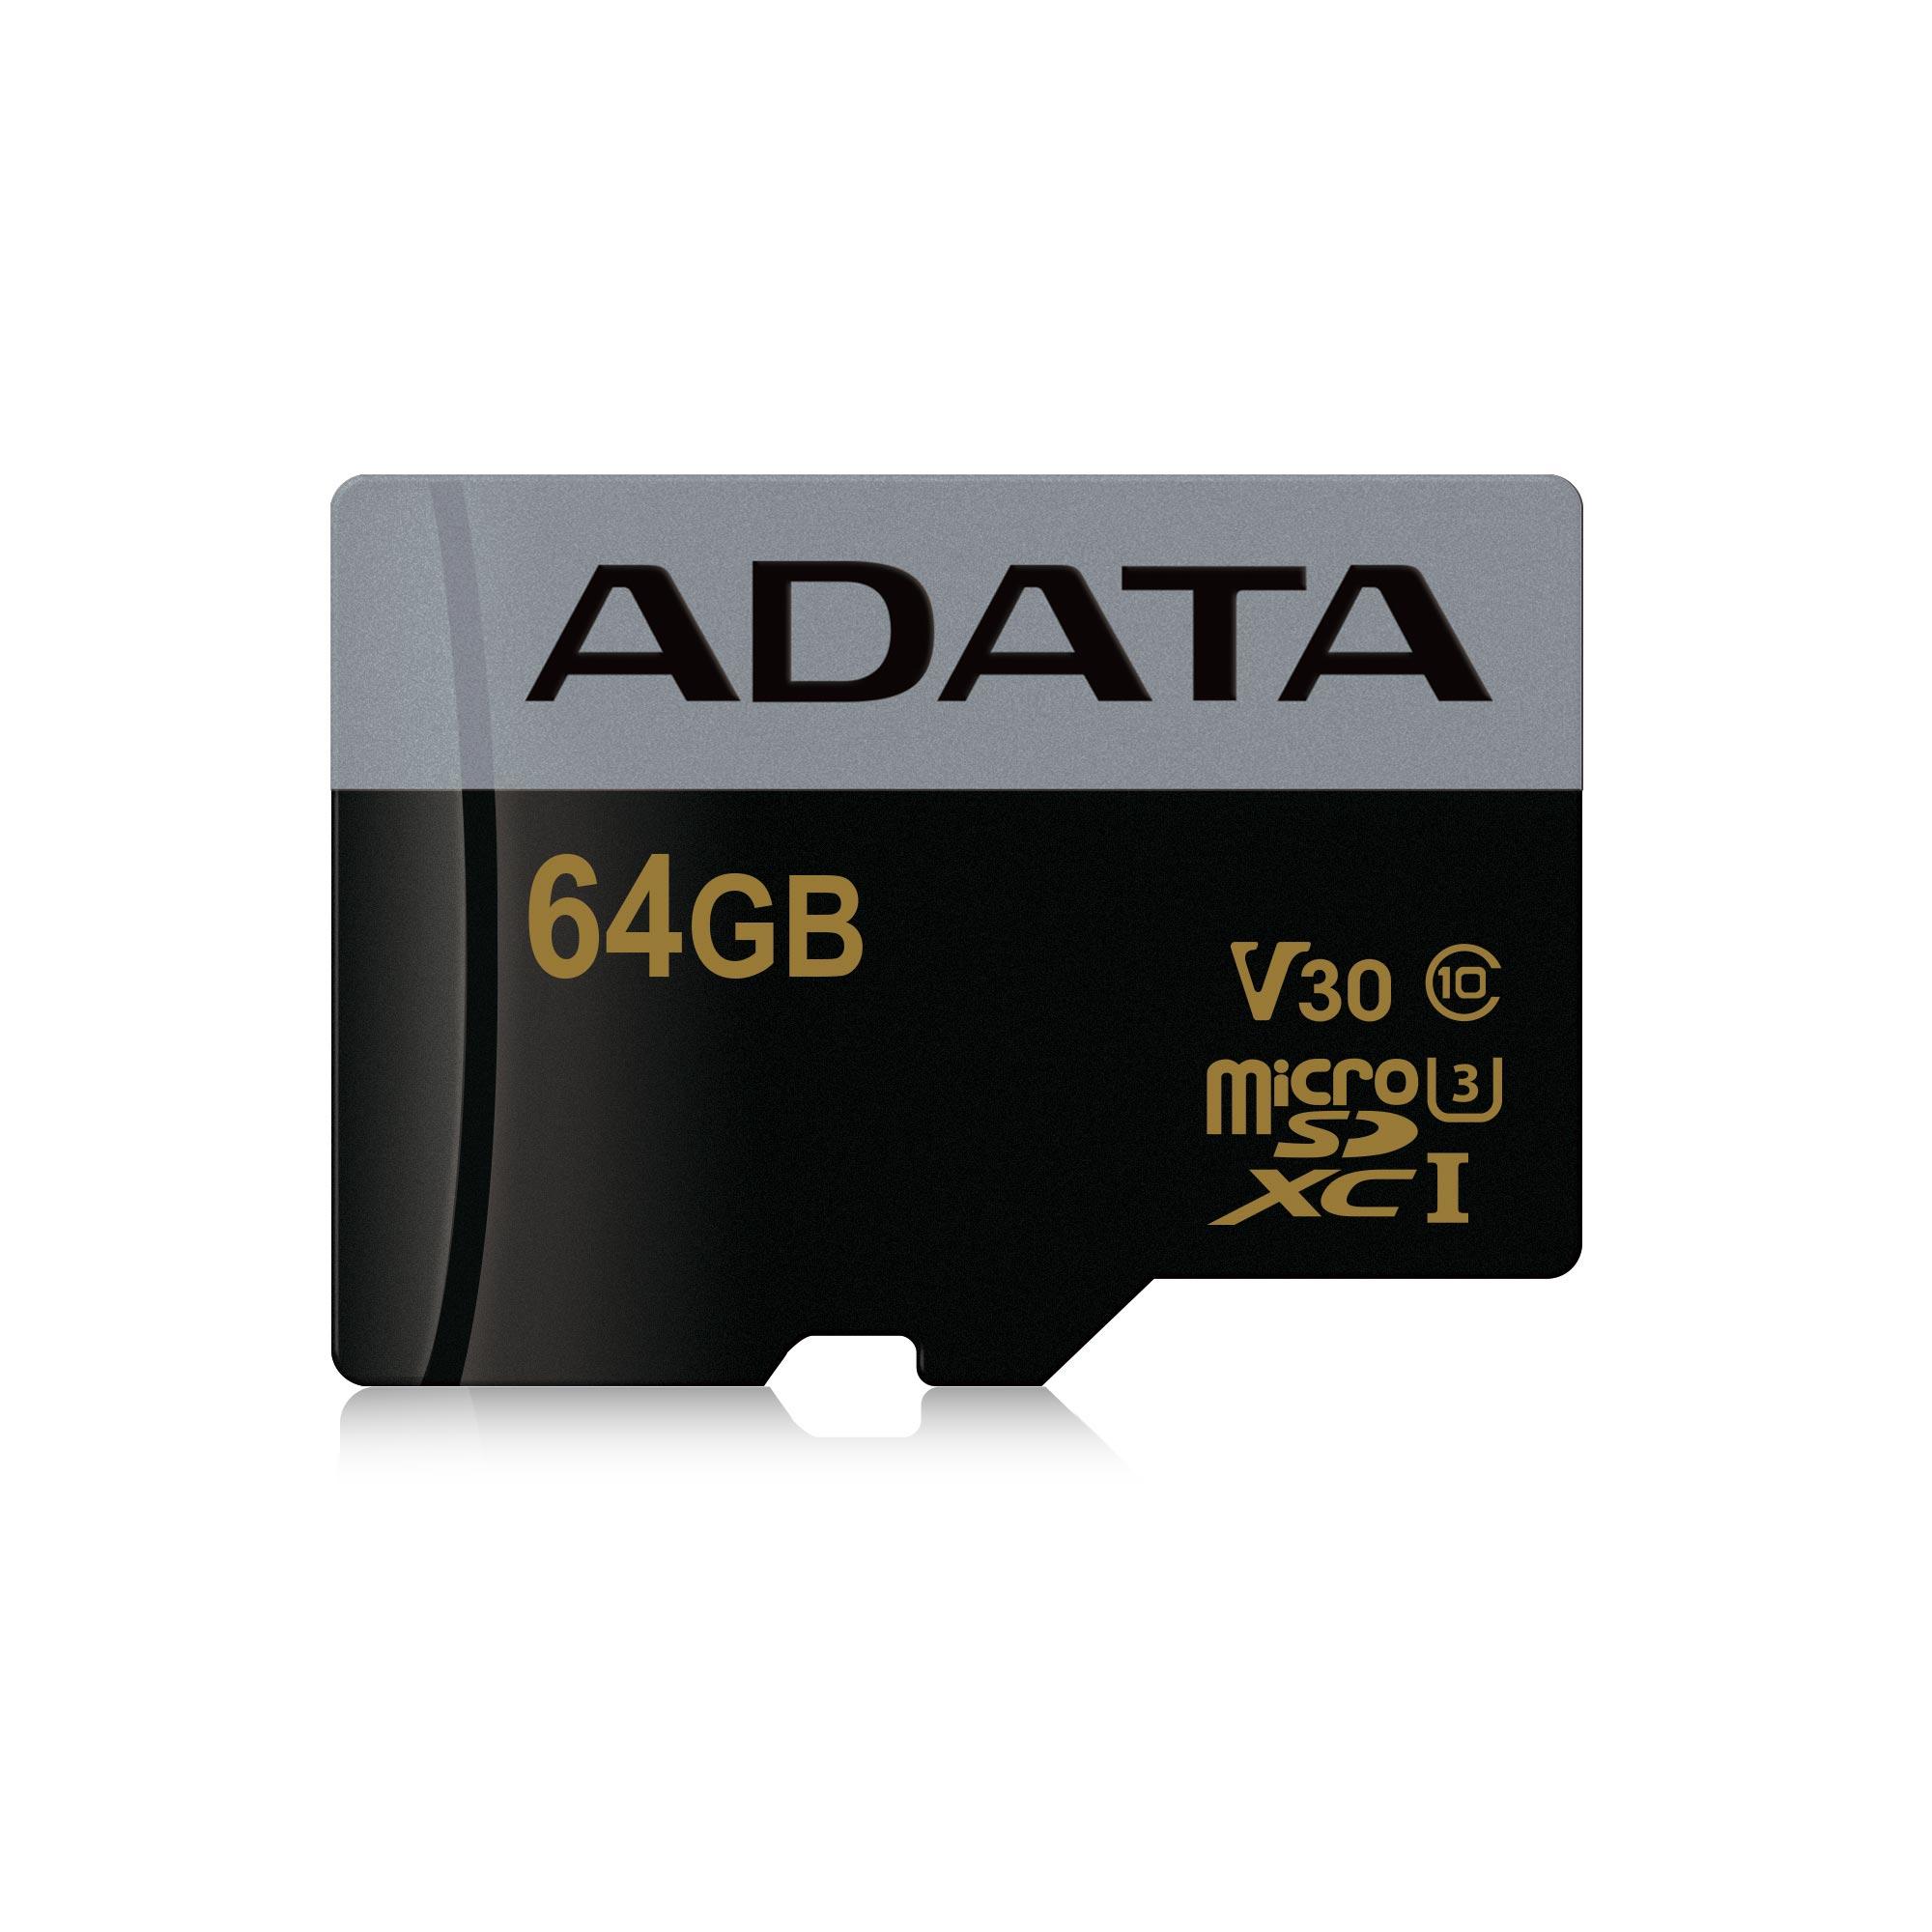 64GB Uhs-i U3 V30 Micro Sdhc